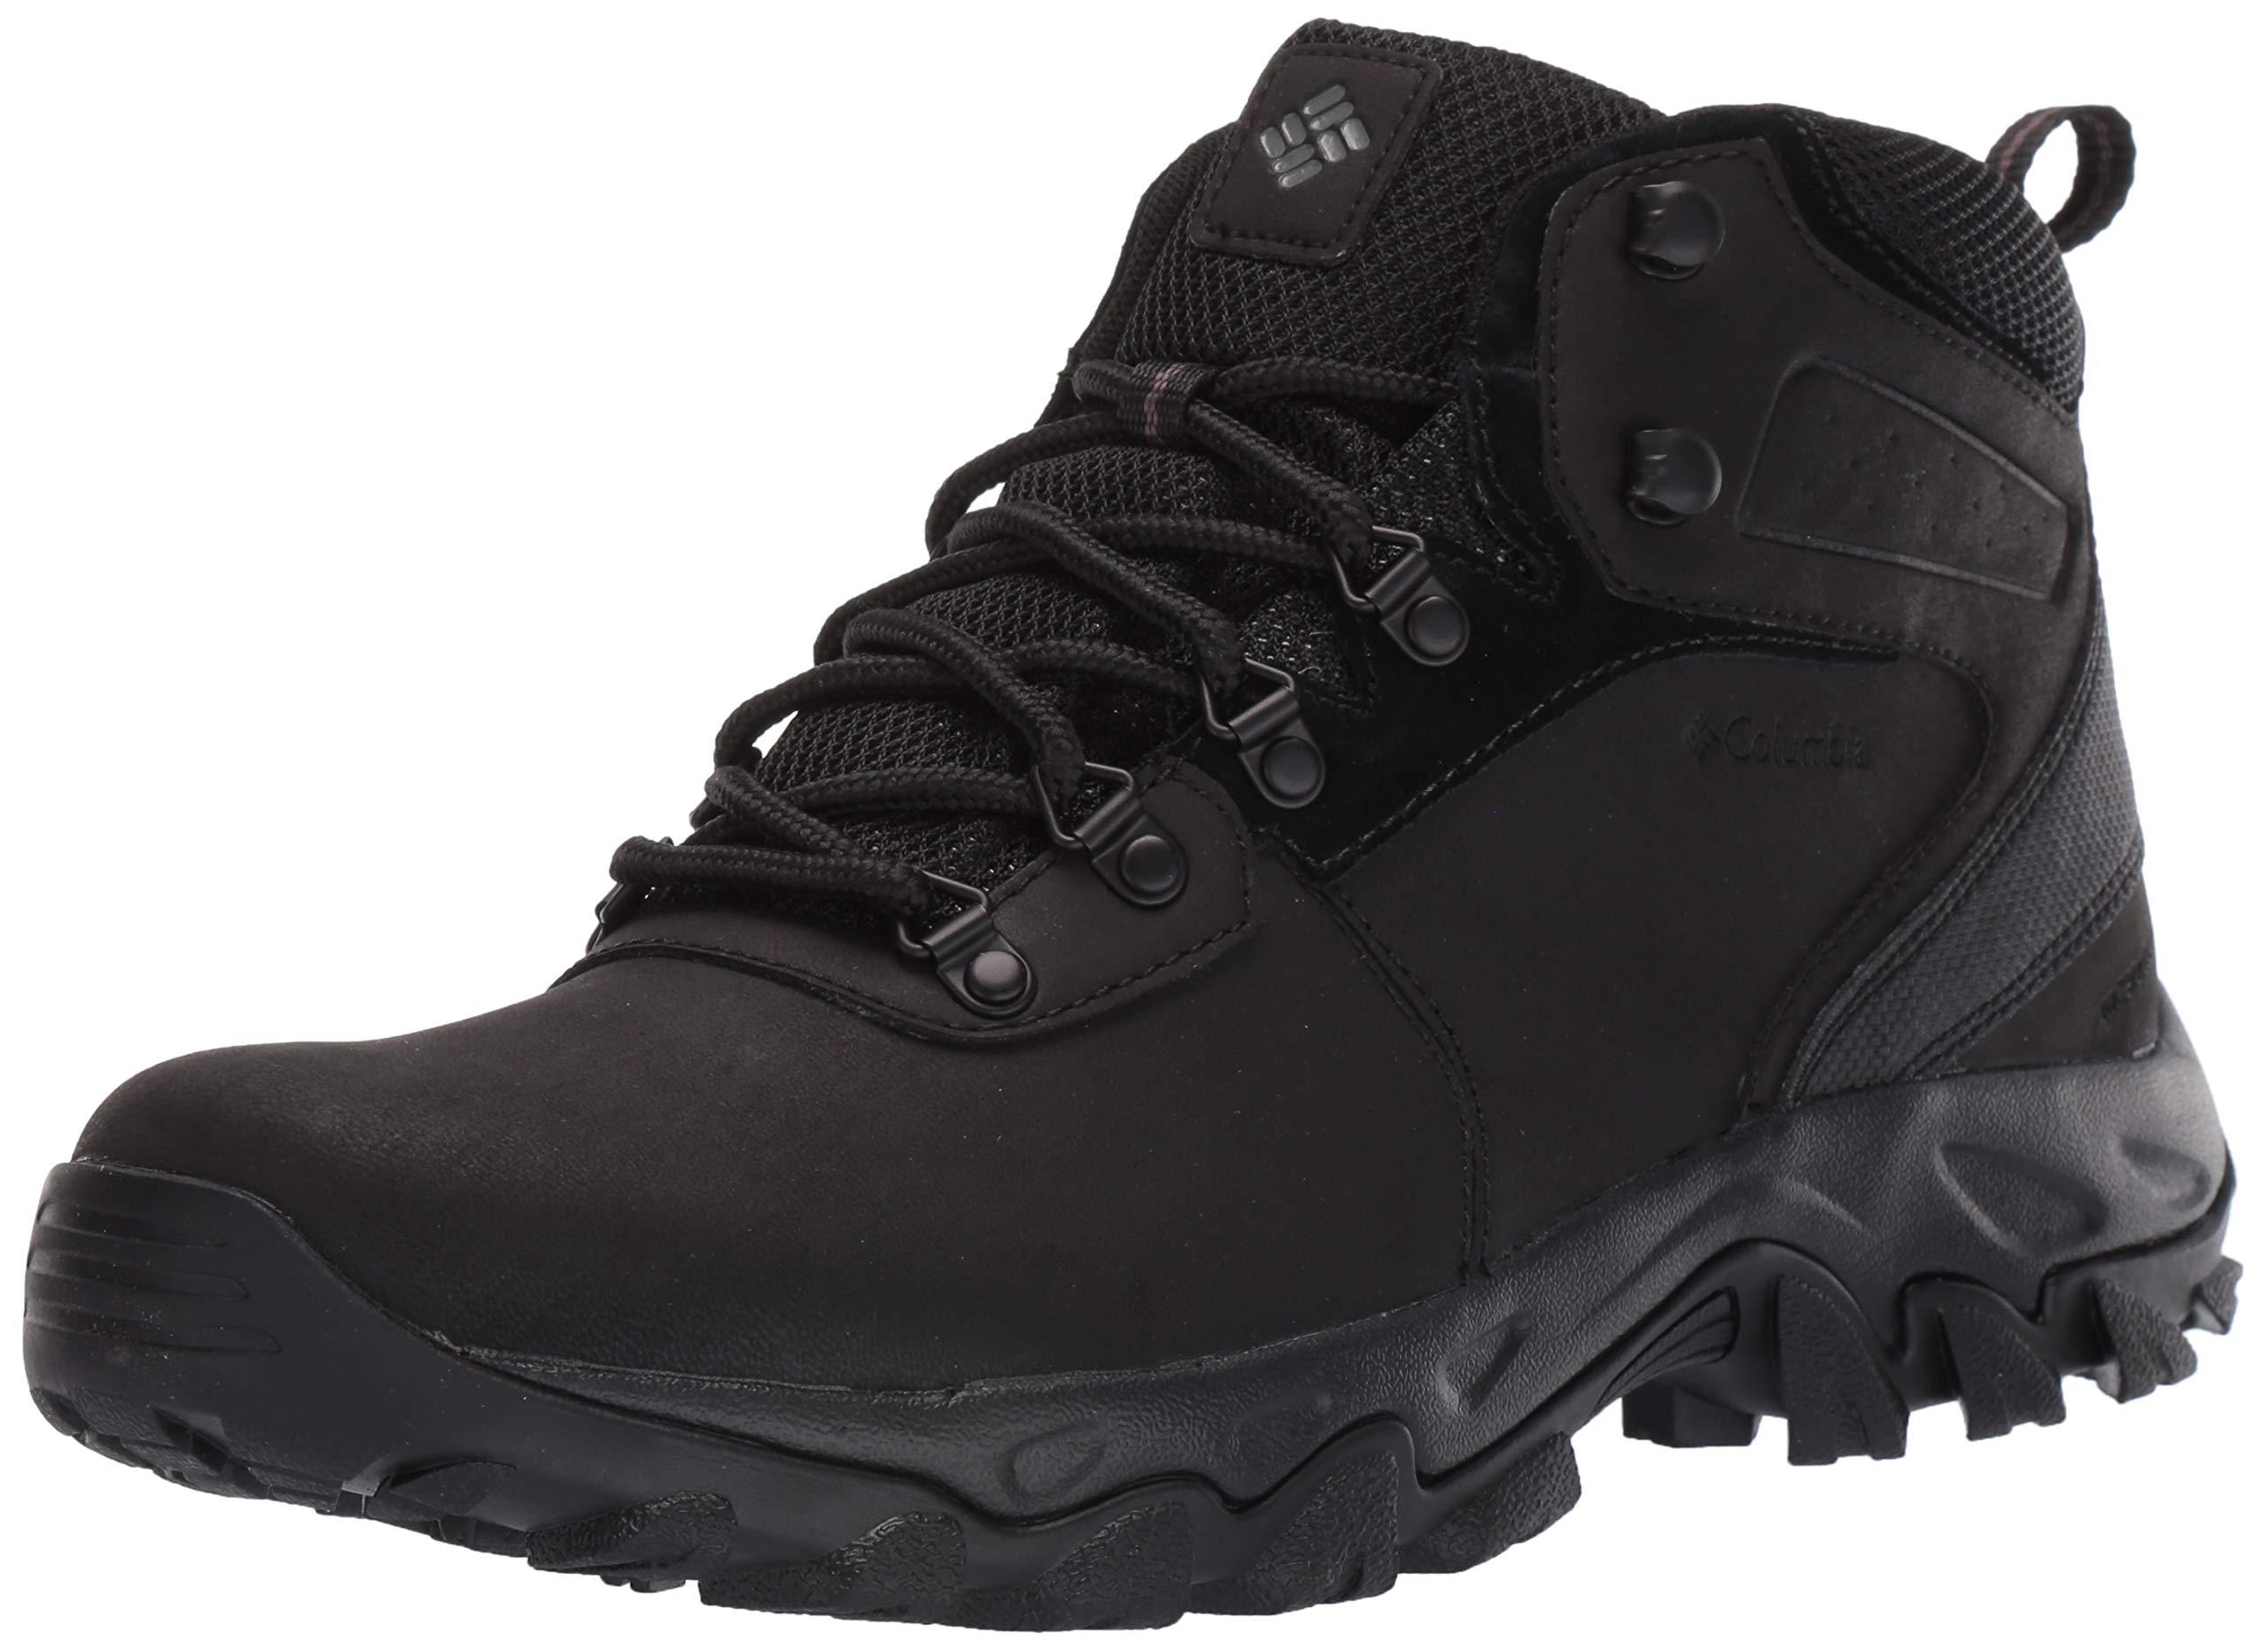 Columbia Men's Newton Ridge Plus II Waterproof Hiking Boot, Black, 7.5 Wide US